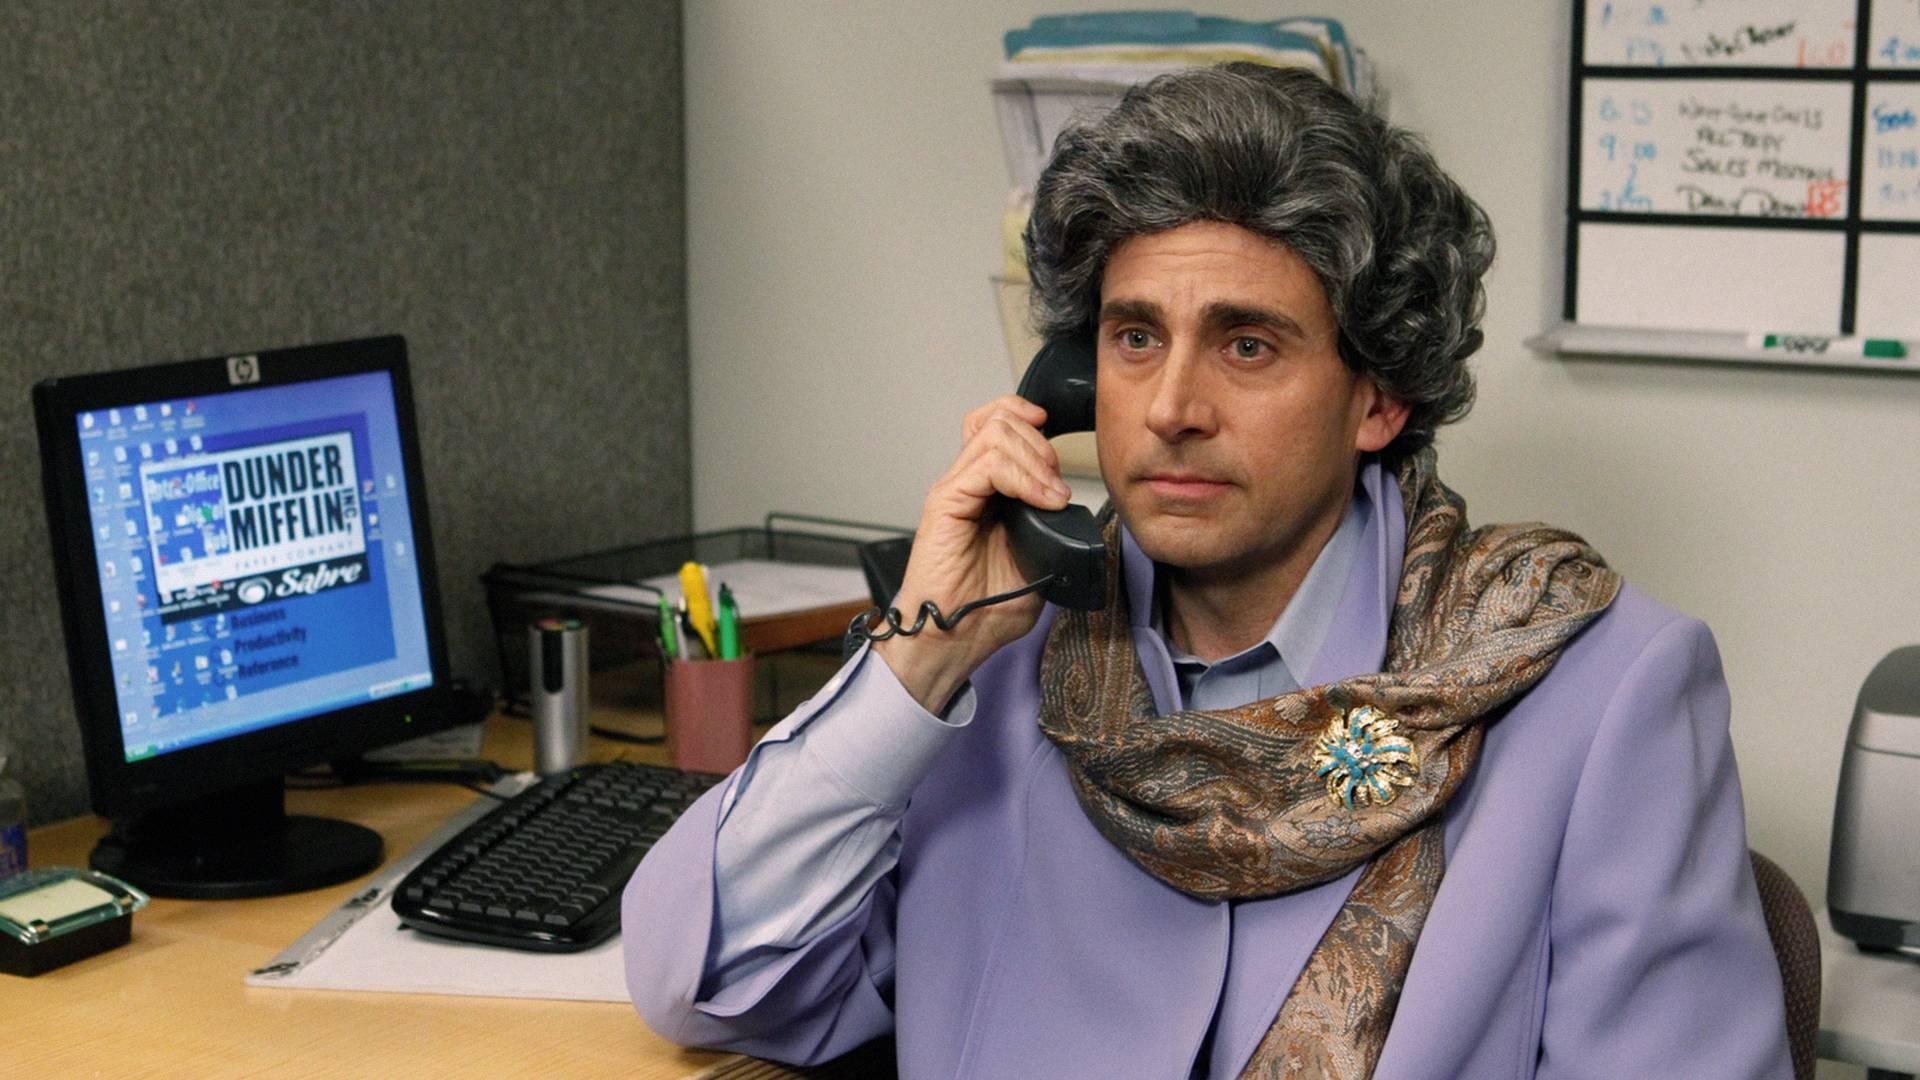 The Office Season 7 Episode 21